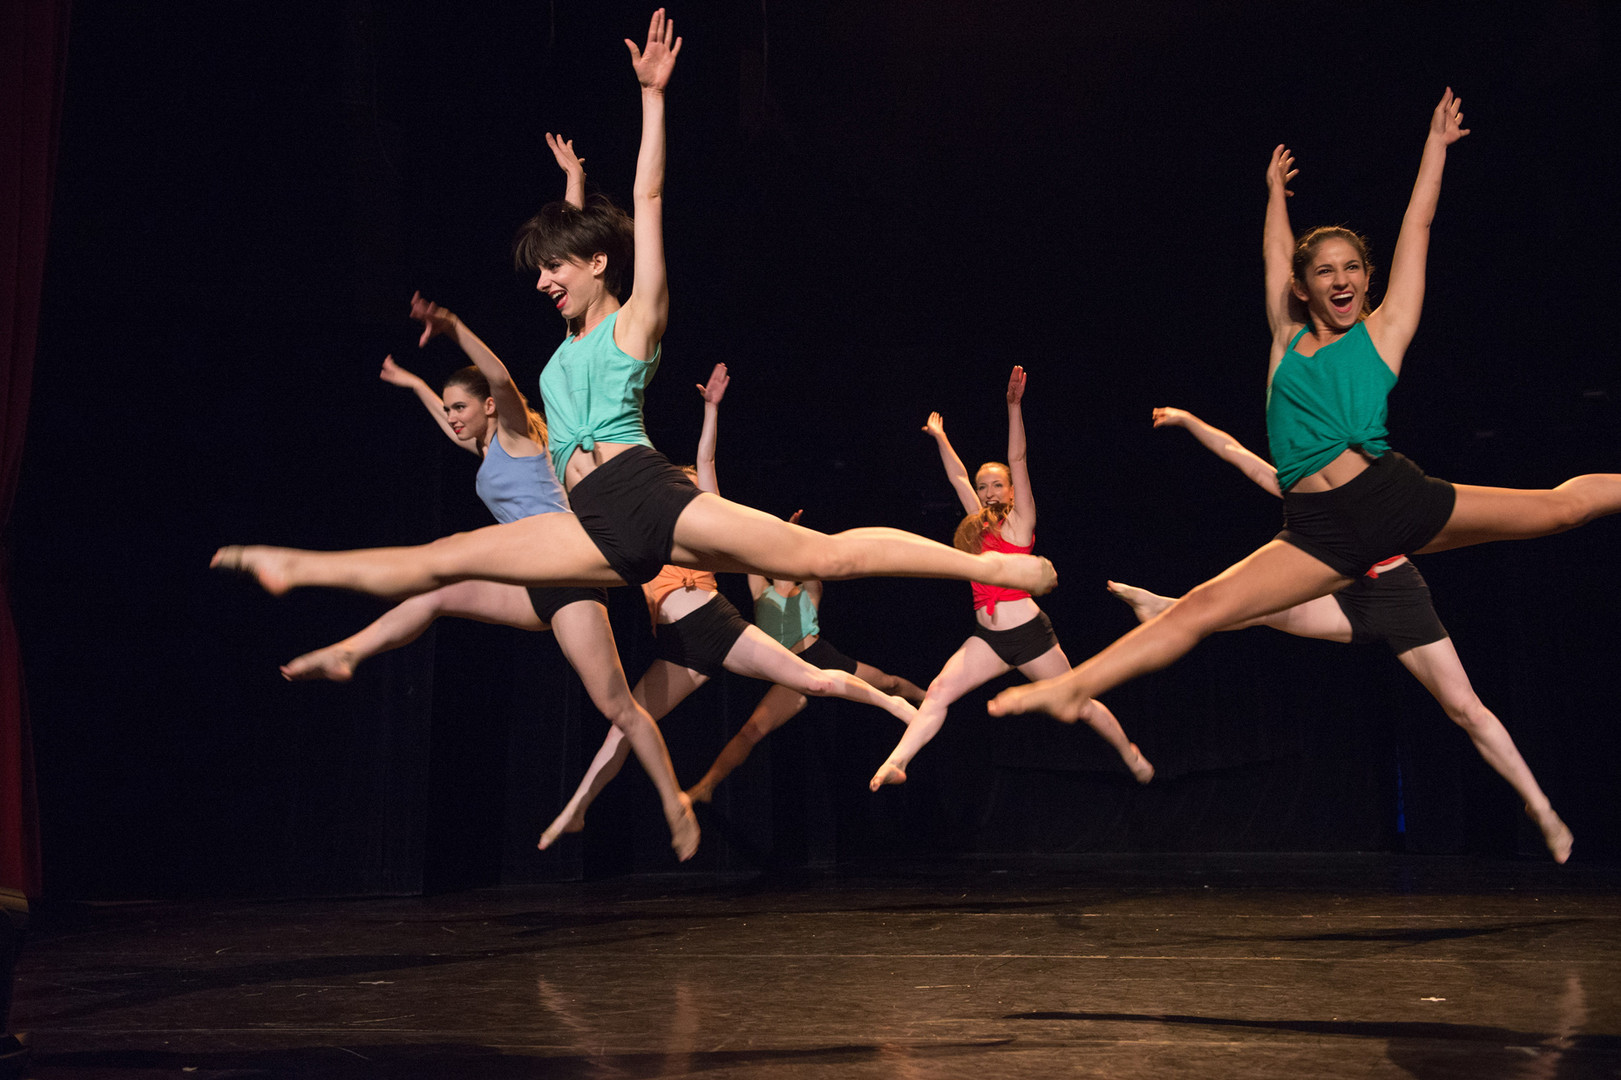 spectacle-danse-50.jpg